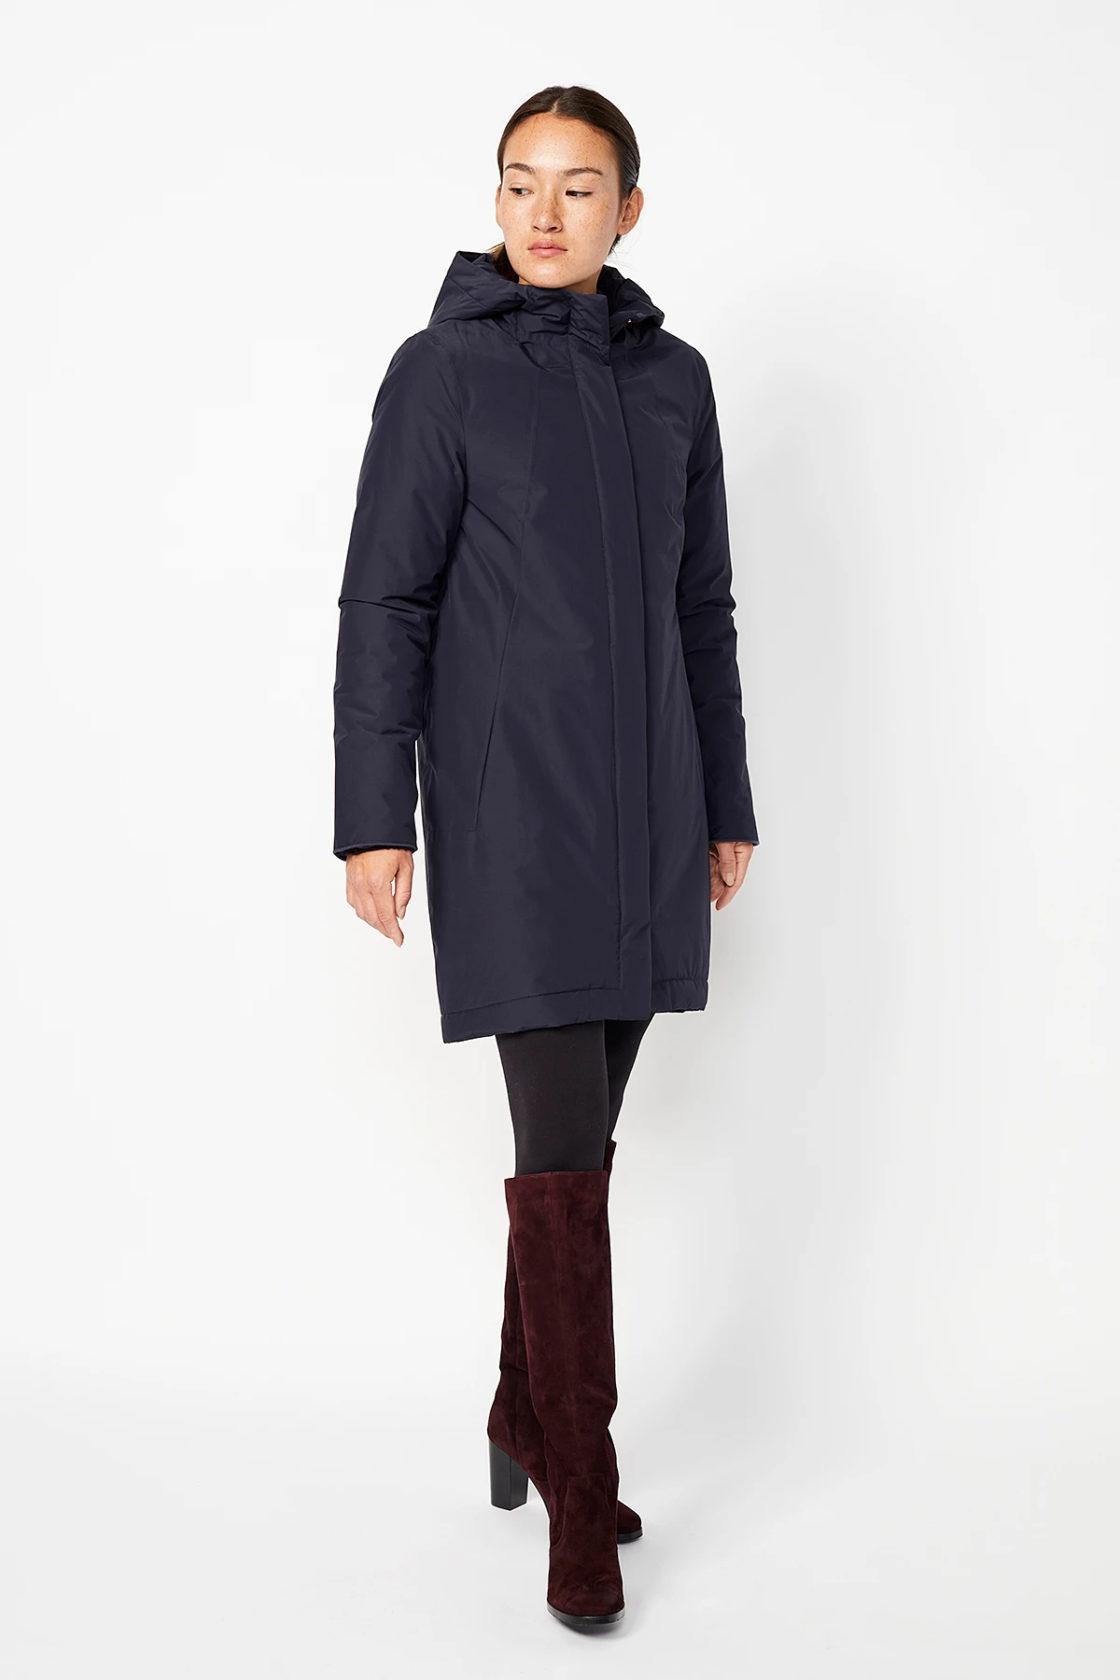 Roberta Organic Fashion Langerchen Coat Ariza Navy 5